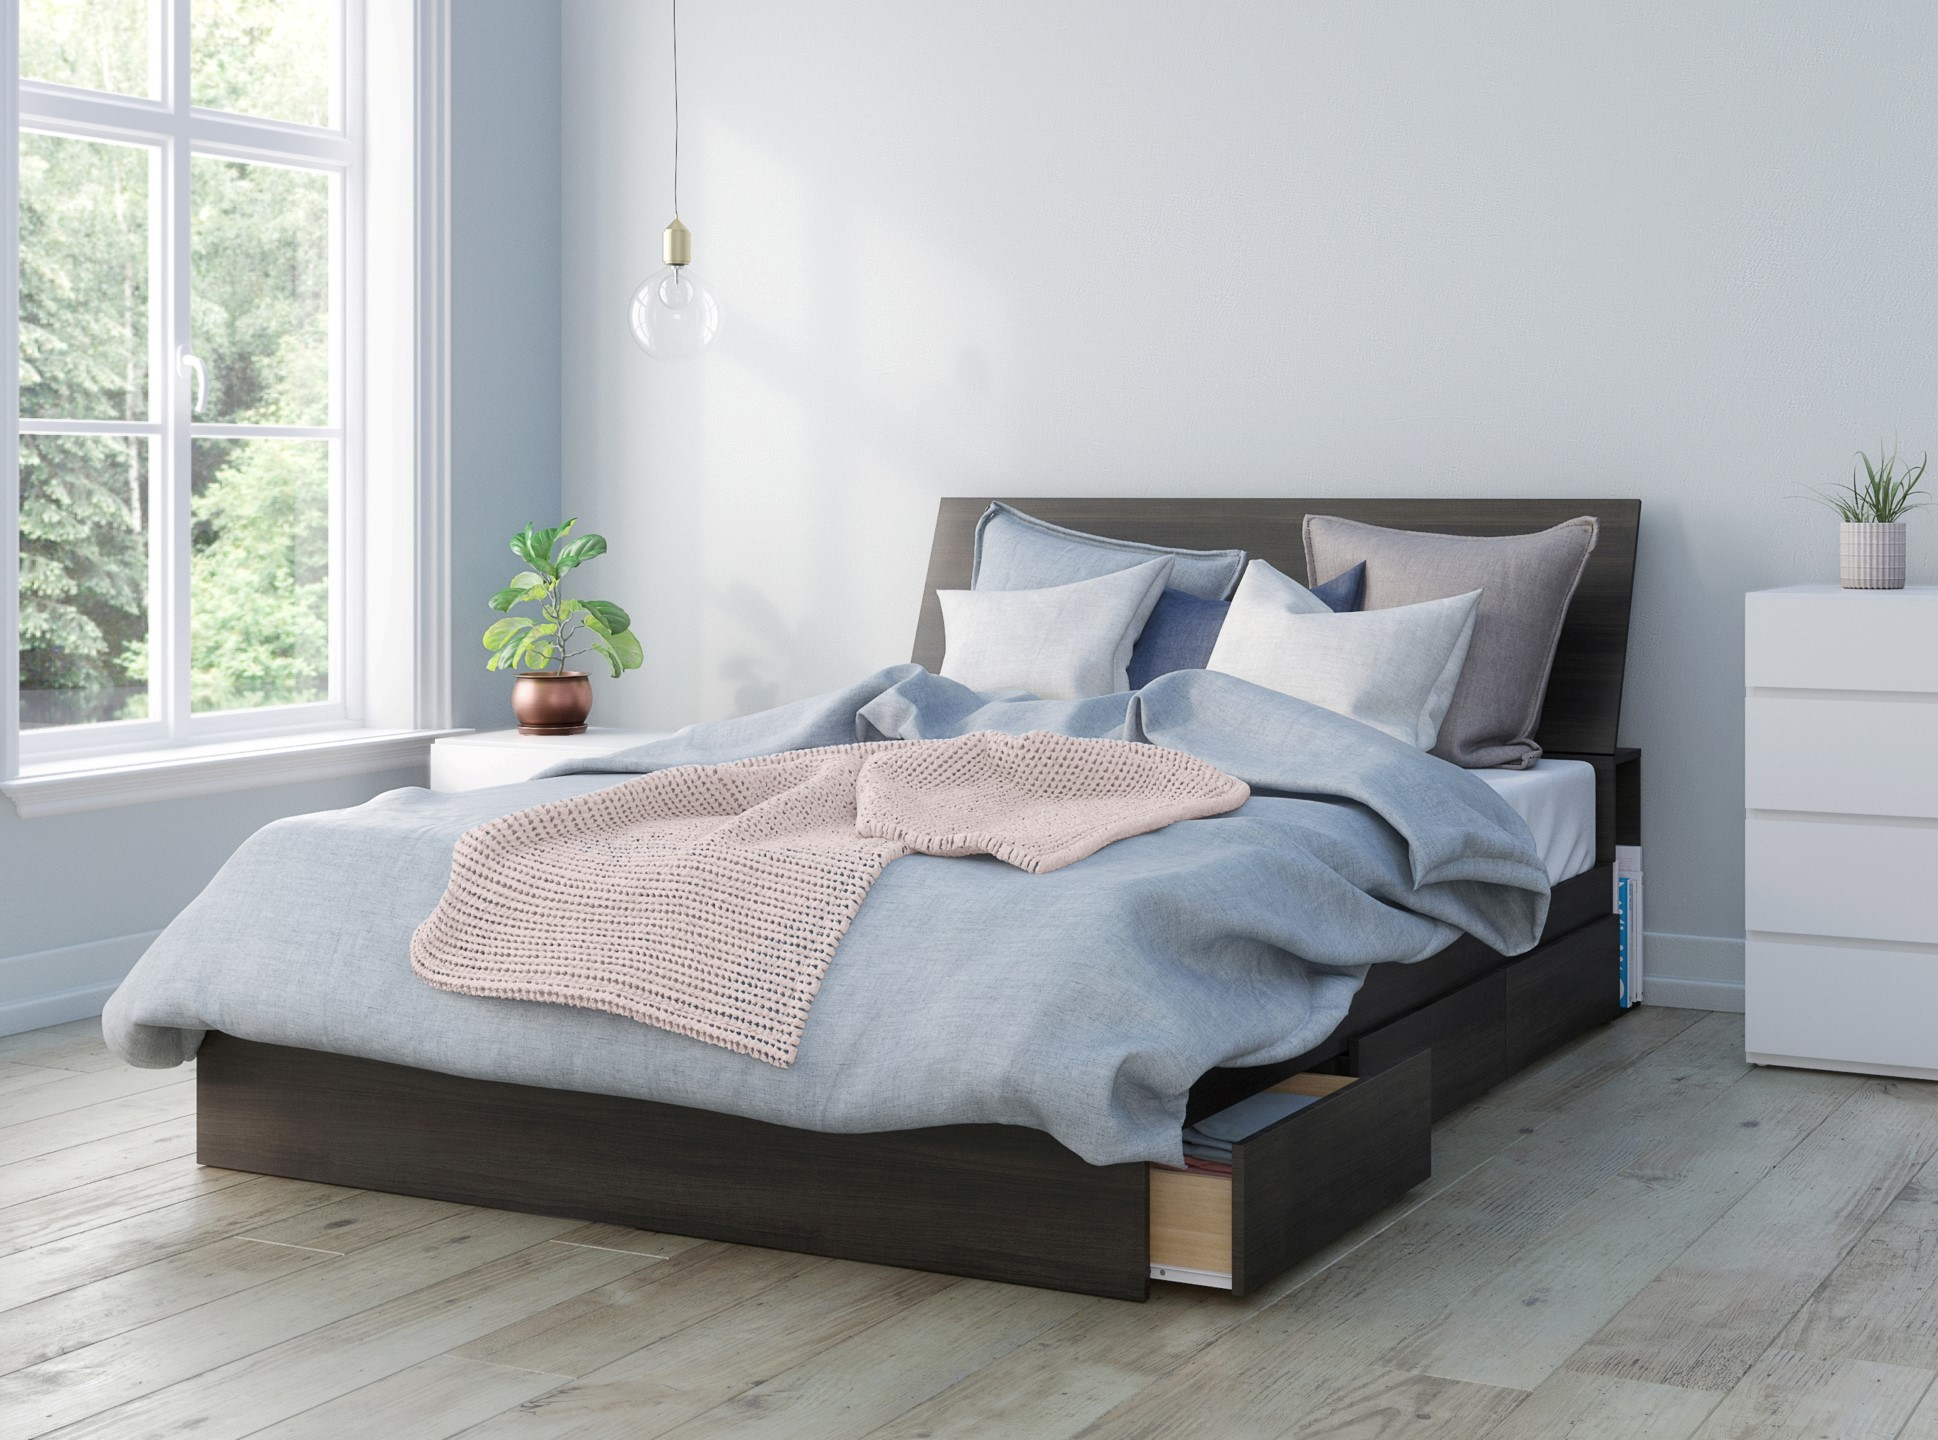 Nexera Iris Contemporary Queen Bedroom Set - 3 Pieces - Ebony/White